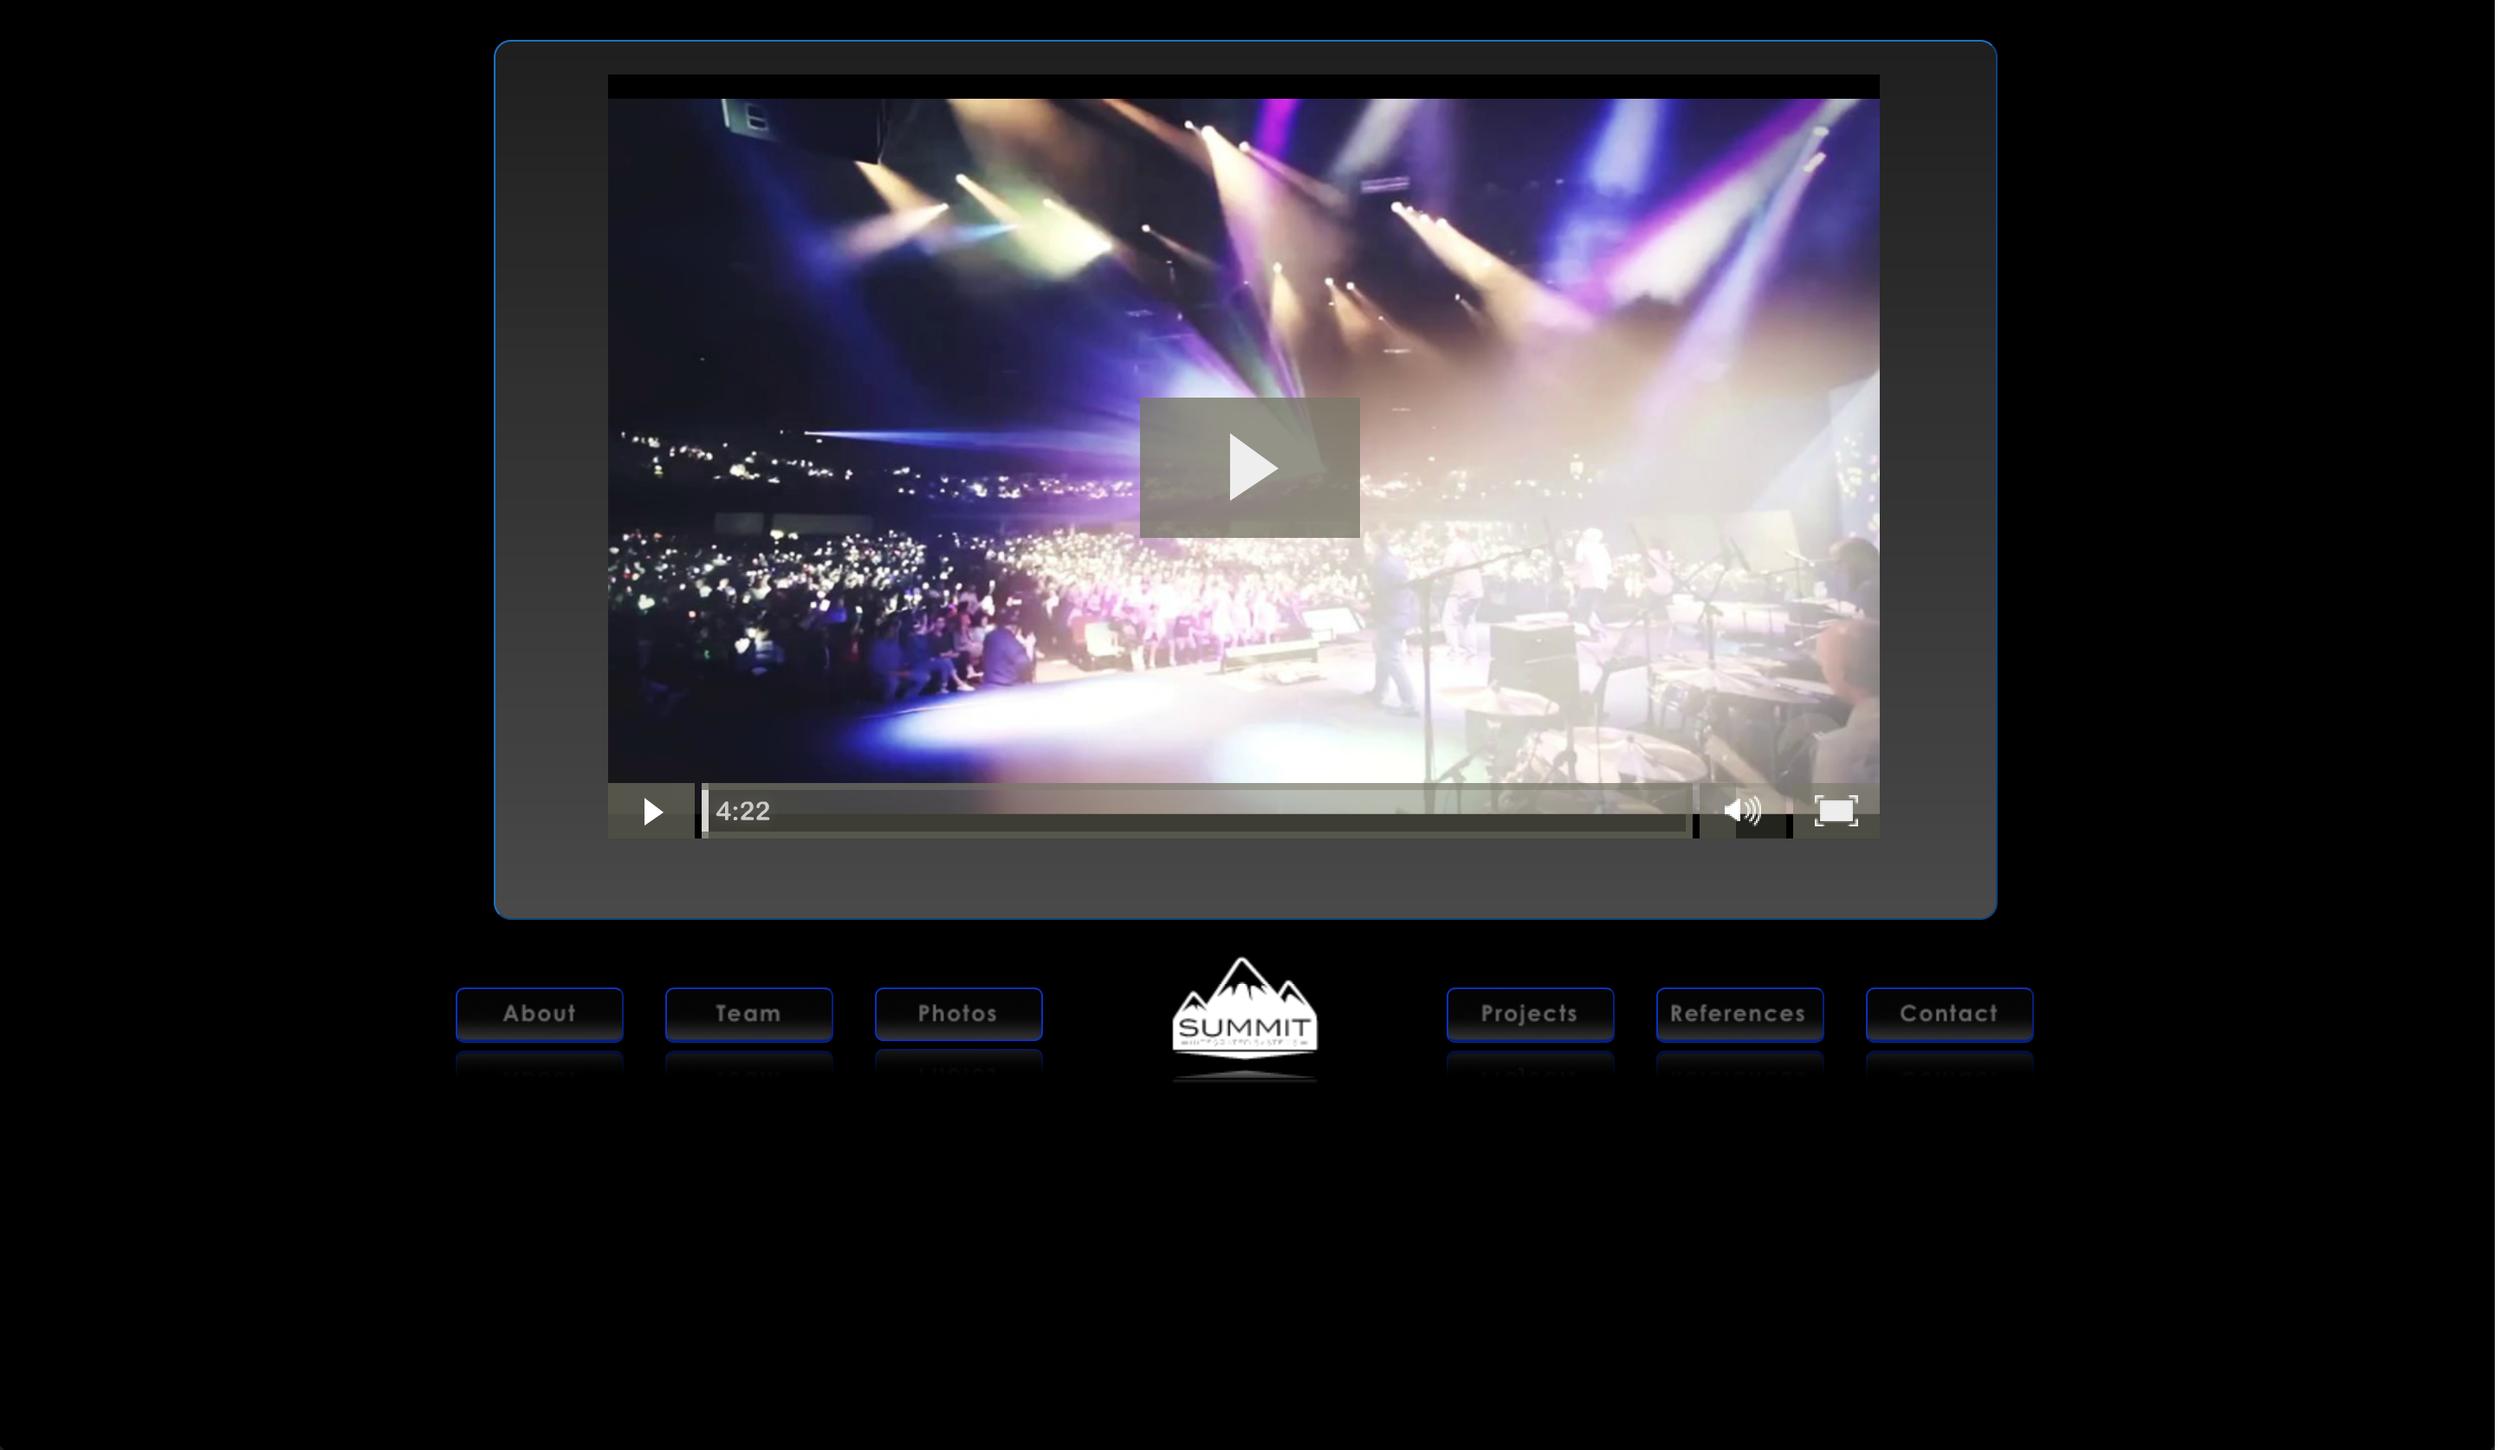 Screen Shot 2014-09-07 at  Sun , 7 Sep   3.14.48 PM.png